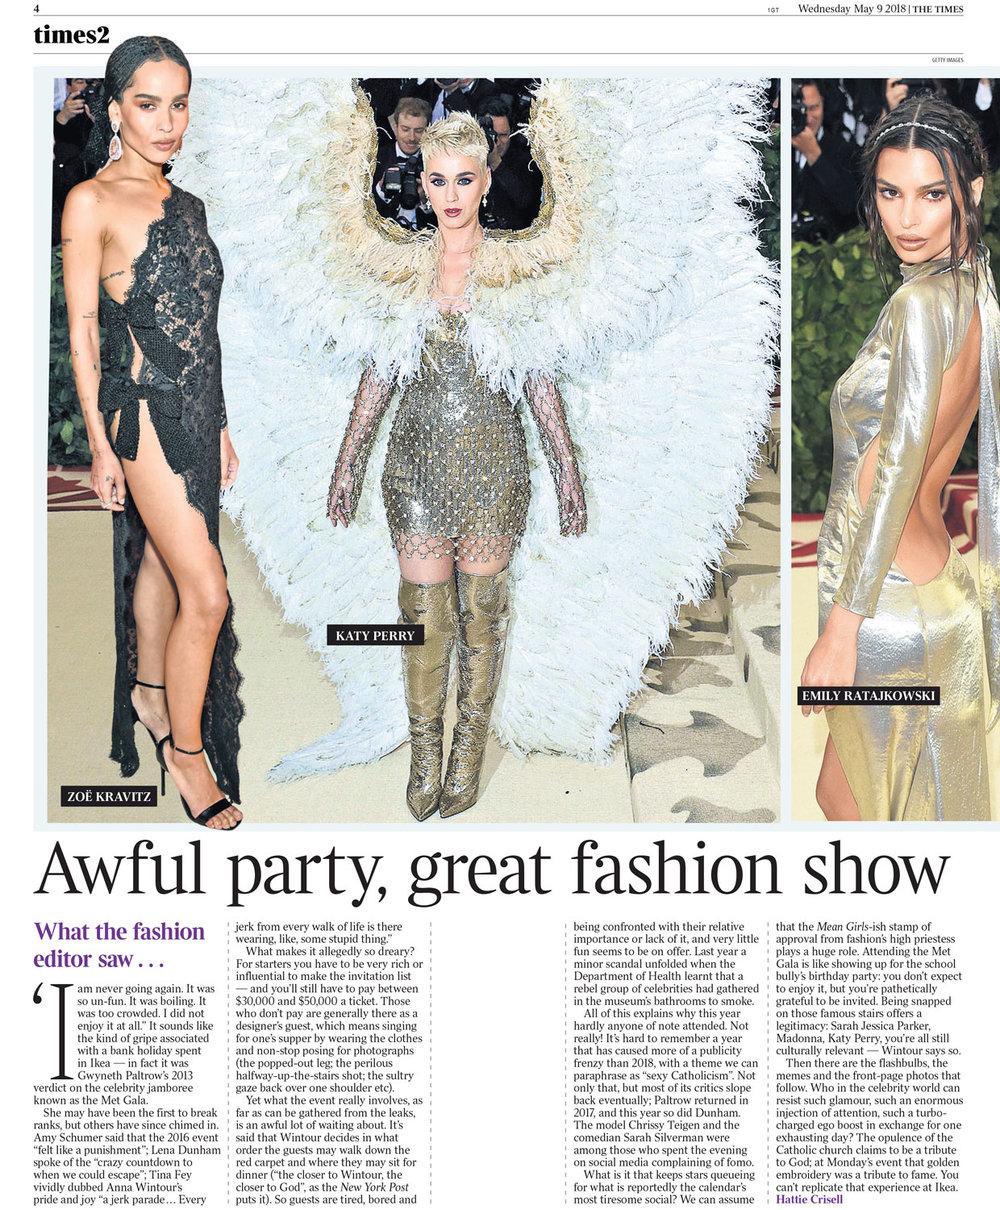 The-Times_09-05-2018_1GT_p4.jpg